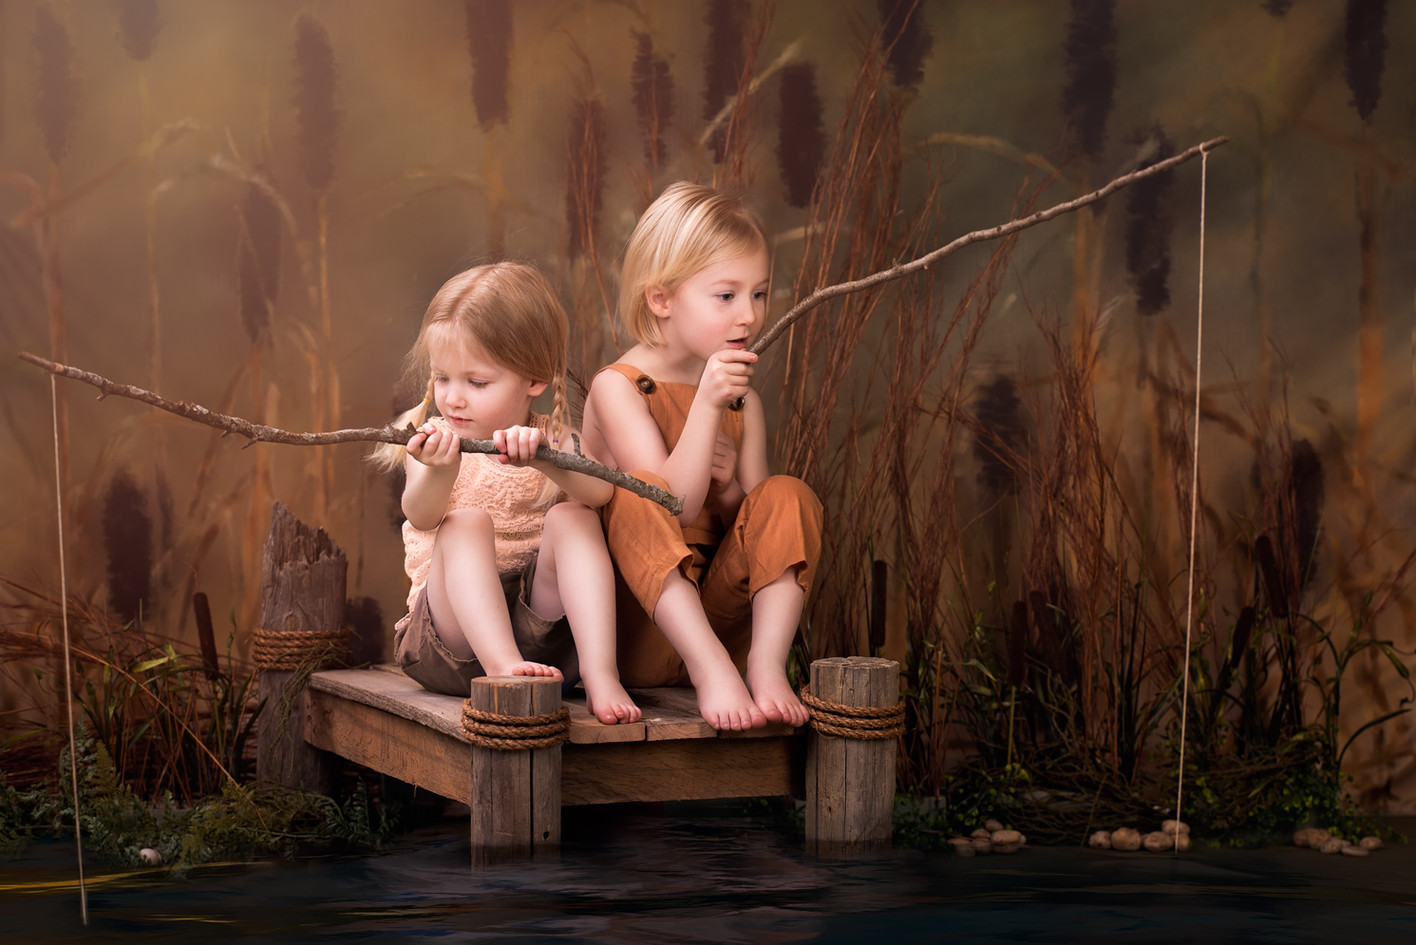 Fishing themed photoshoot